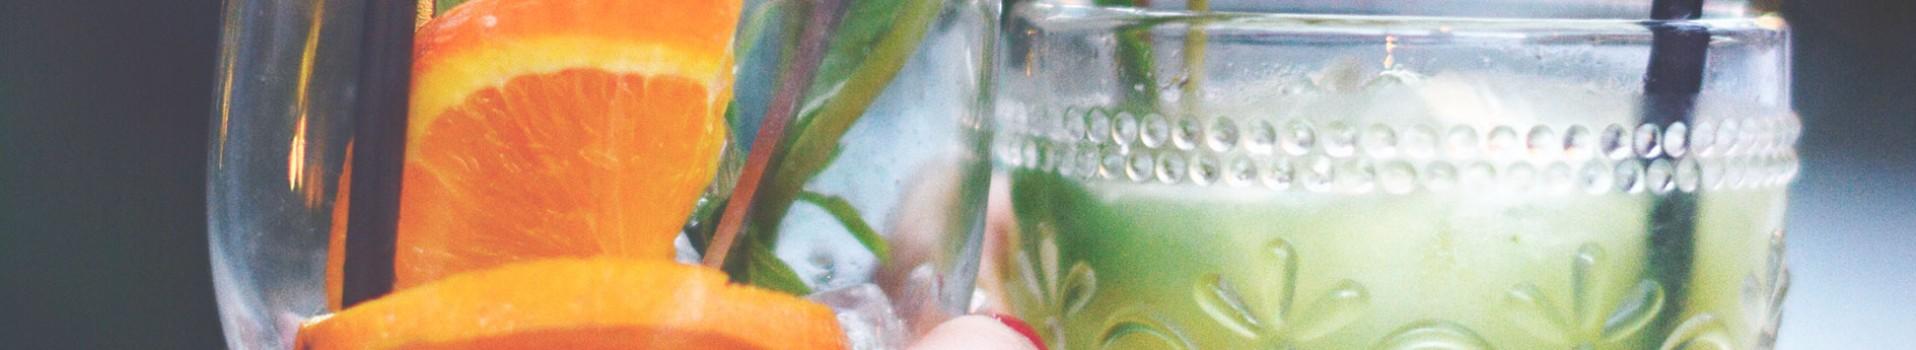 artisan cocktails